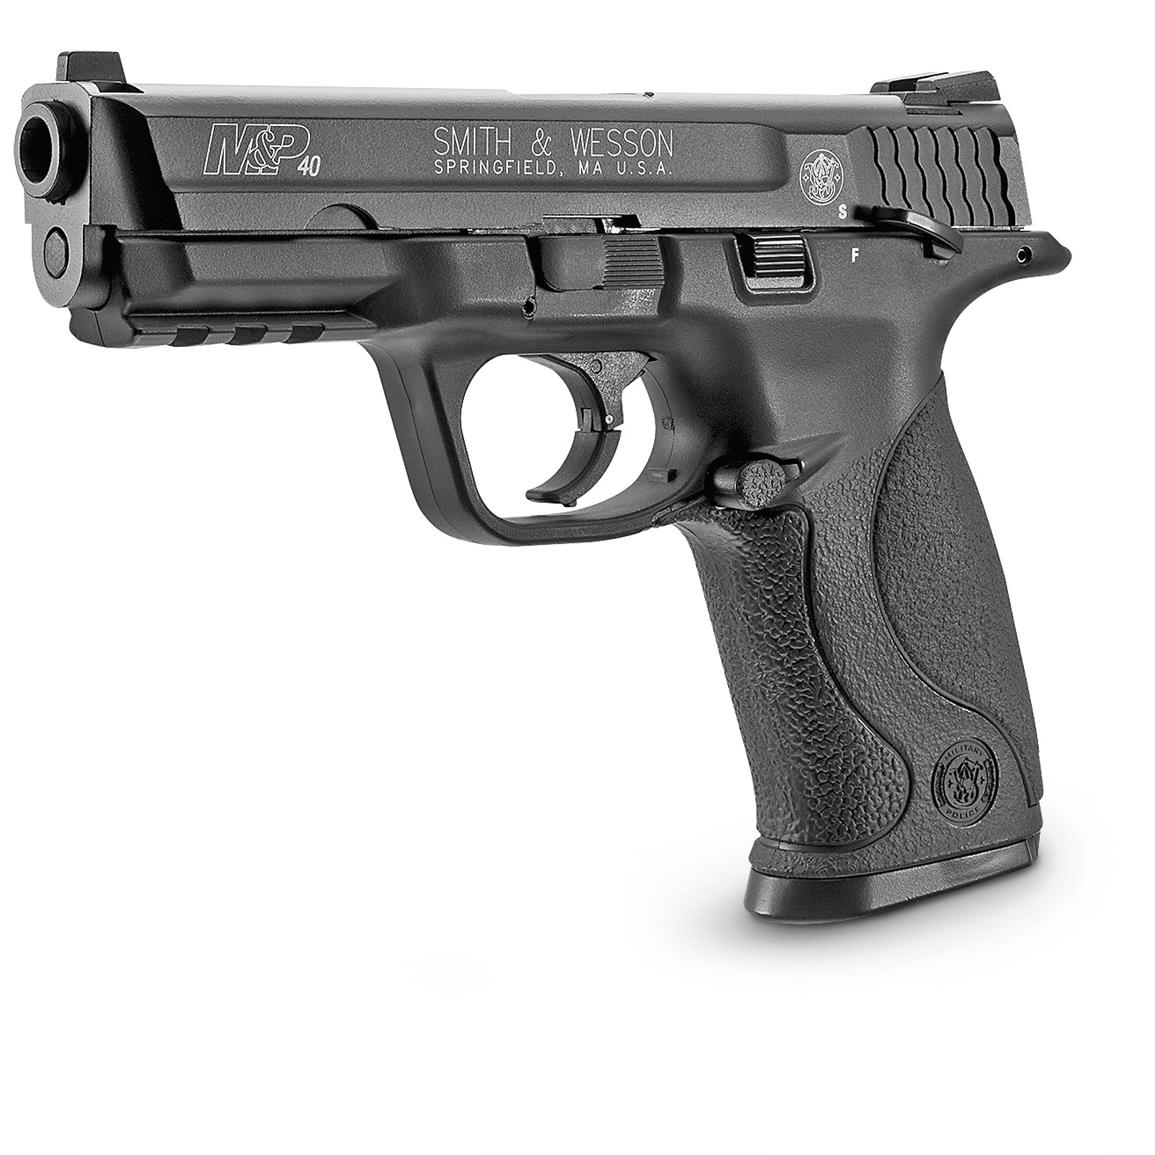 Umarex Smith & Wesson M & P40 BB Pistol